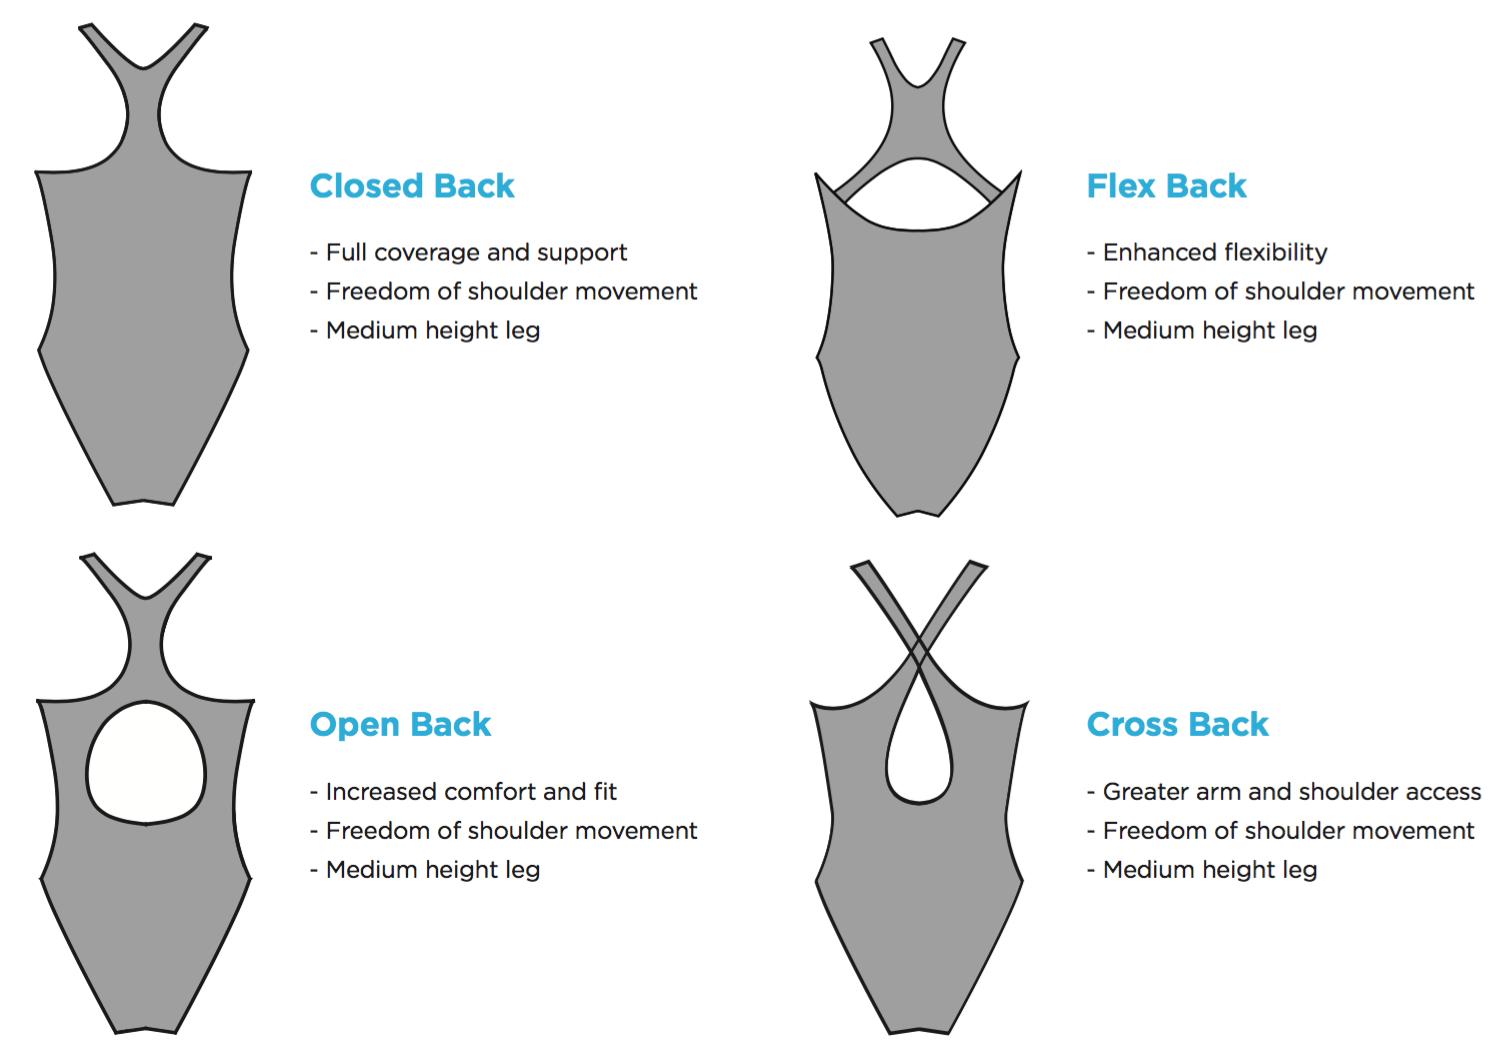 Core swim back options, market leading quality, sun protection, chlorine resistance, many design